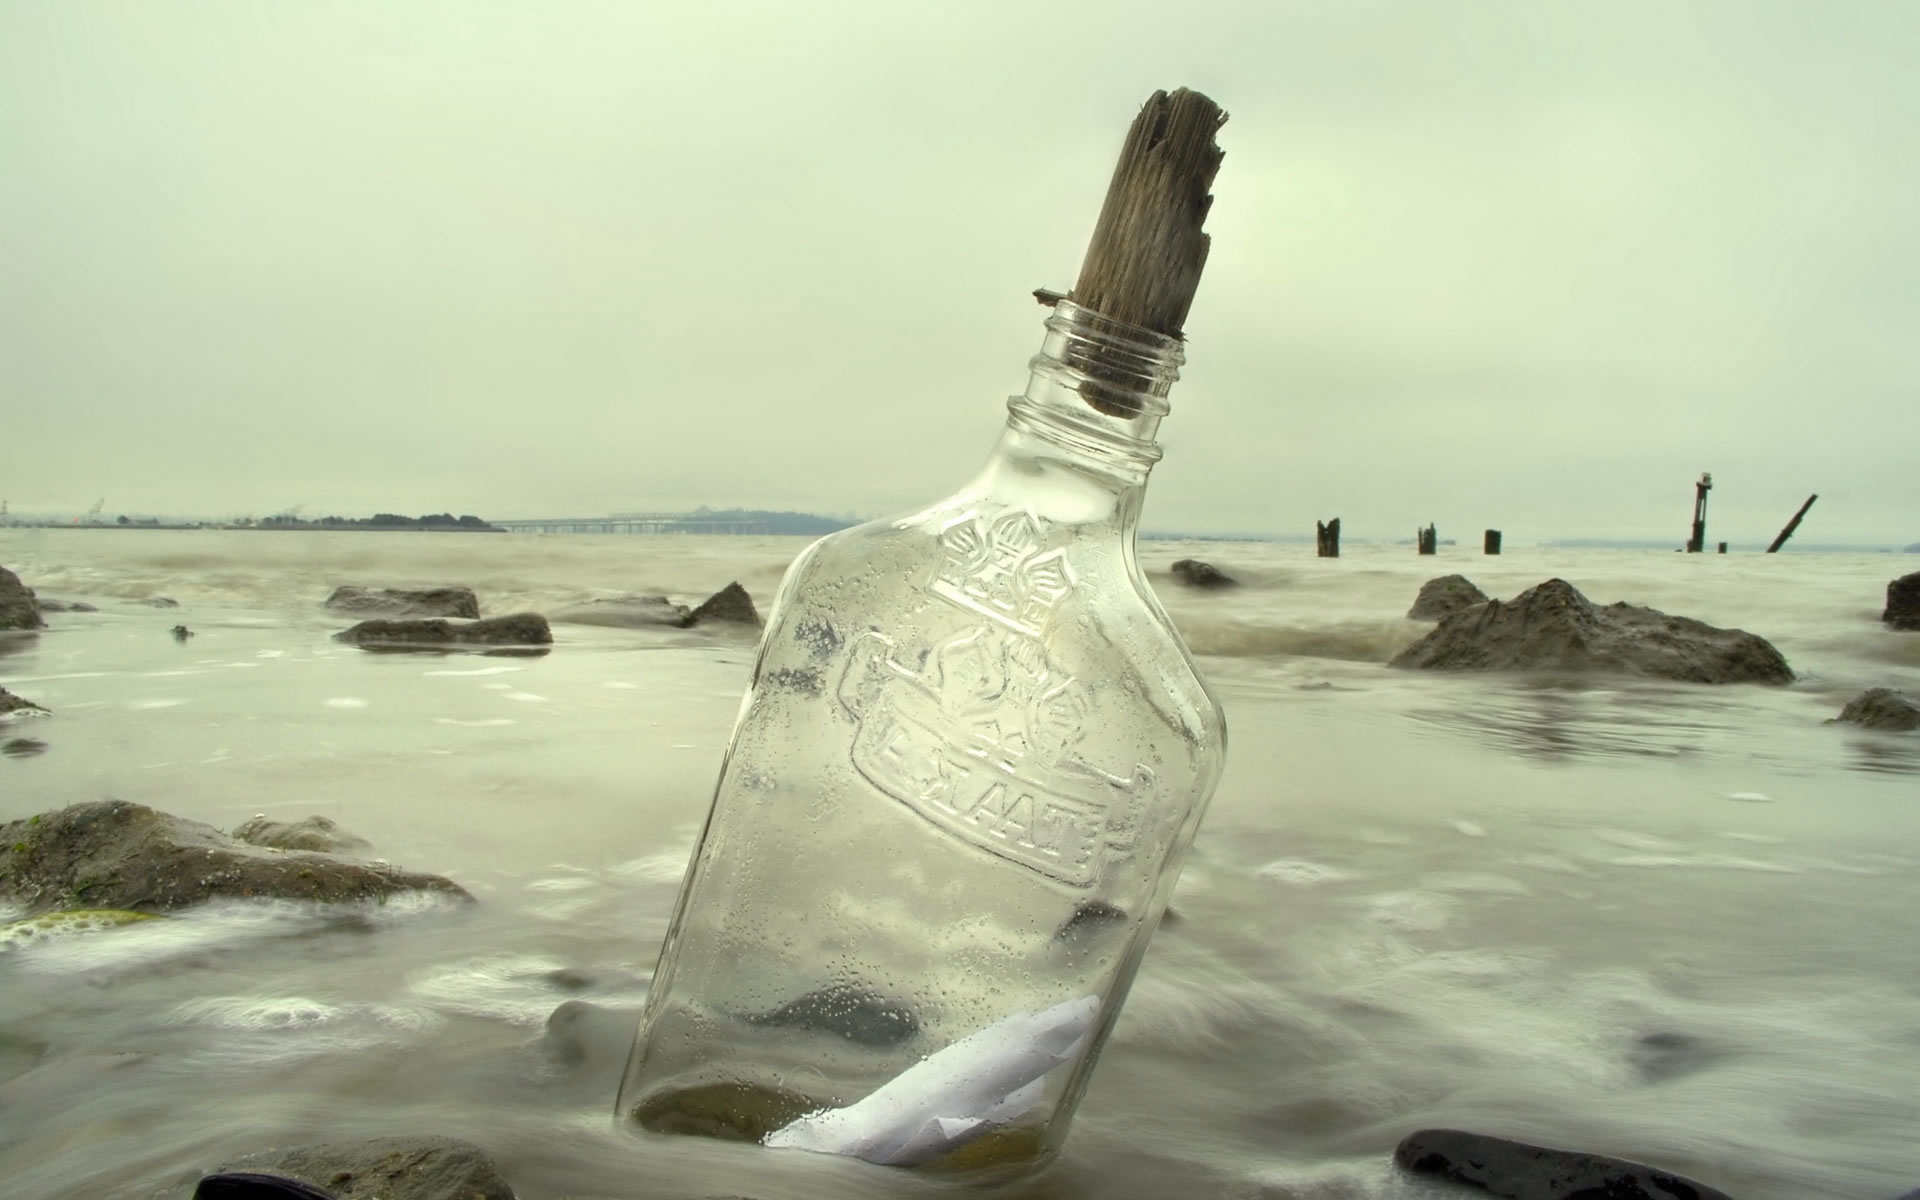 Mensaje en botella a la deriva